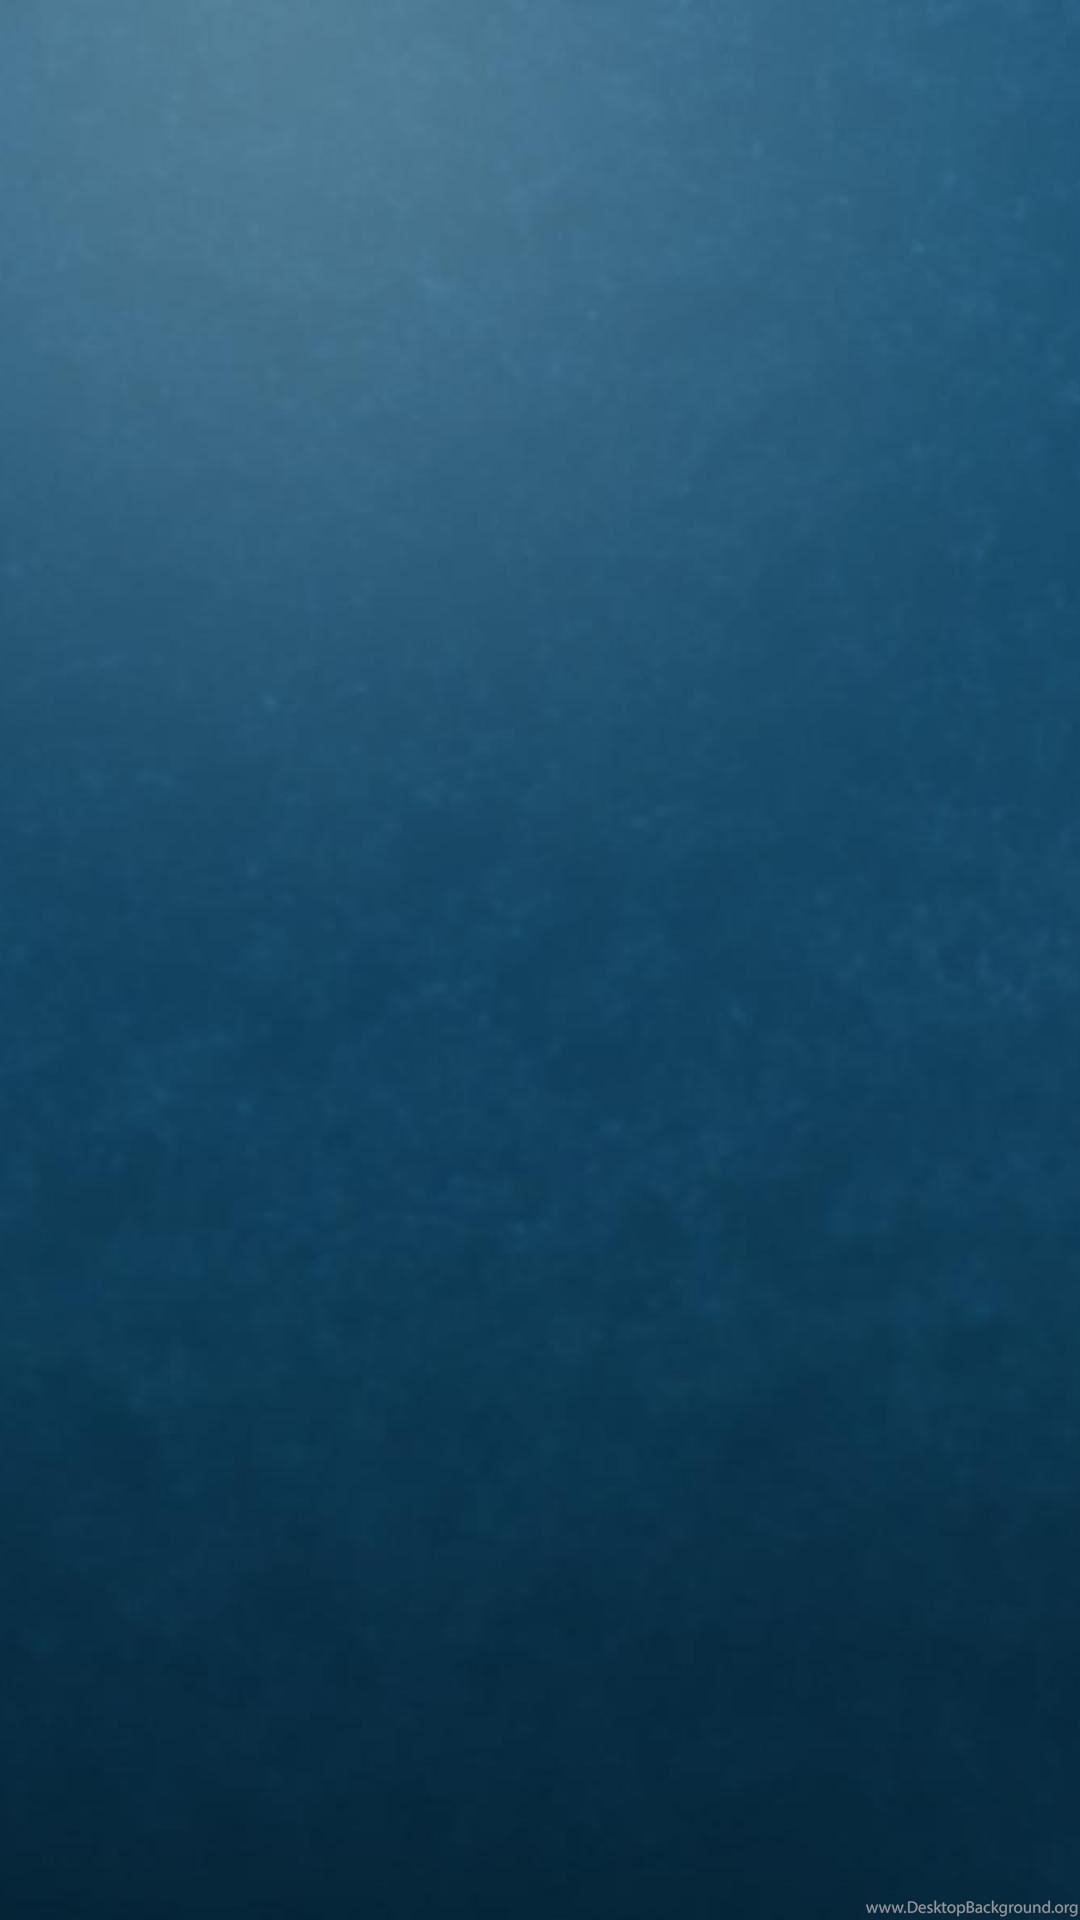 Blue Plain Backgrounds Wallpapers Desktop Background